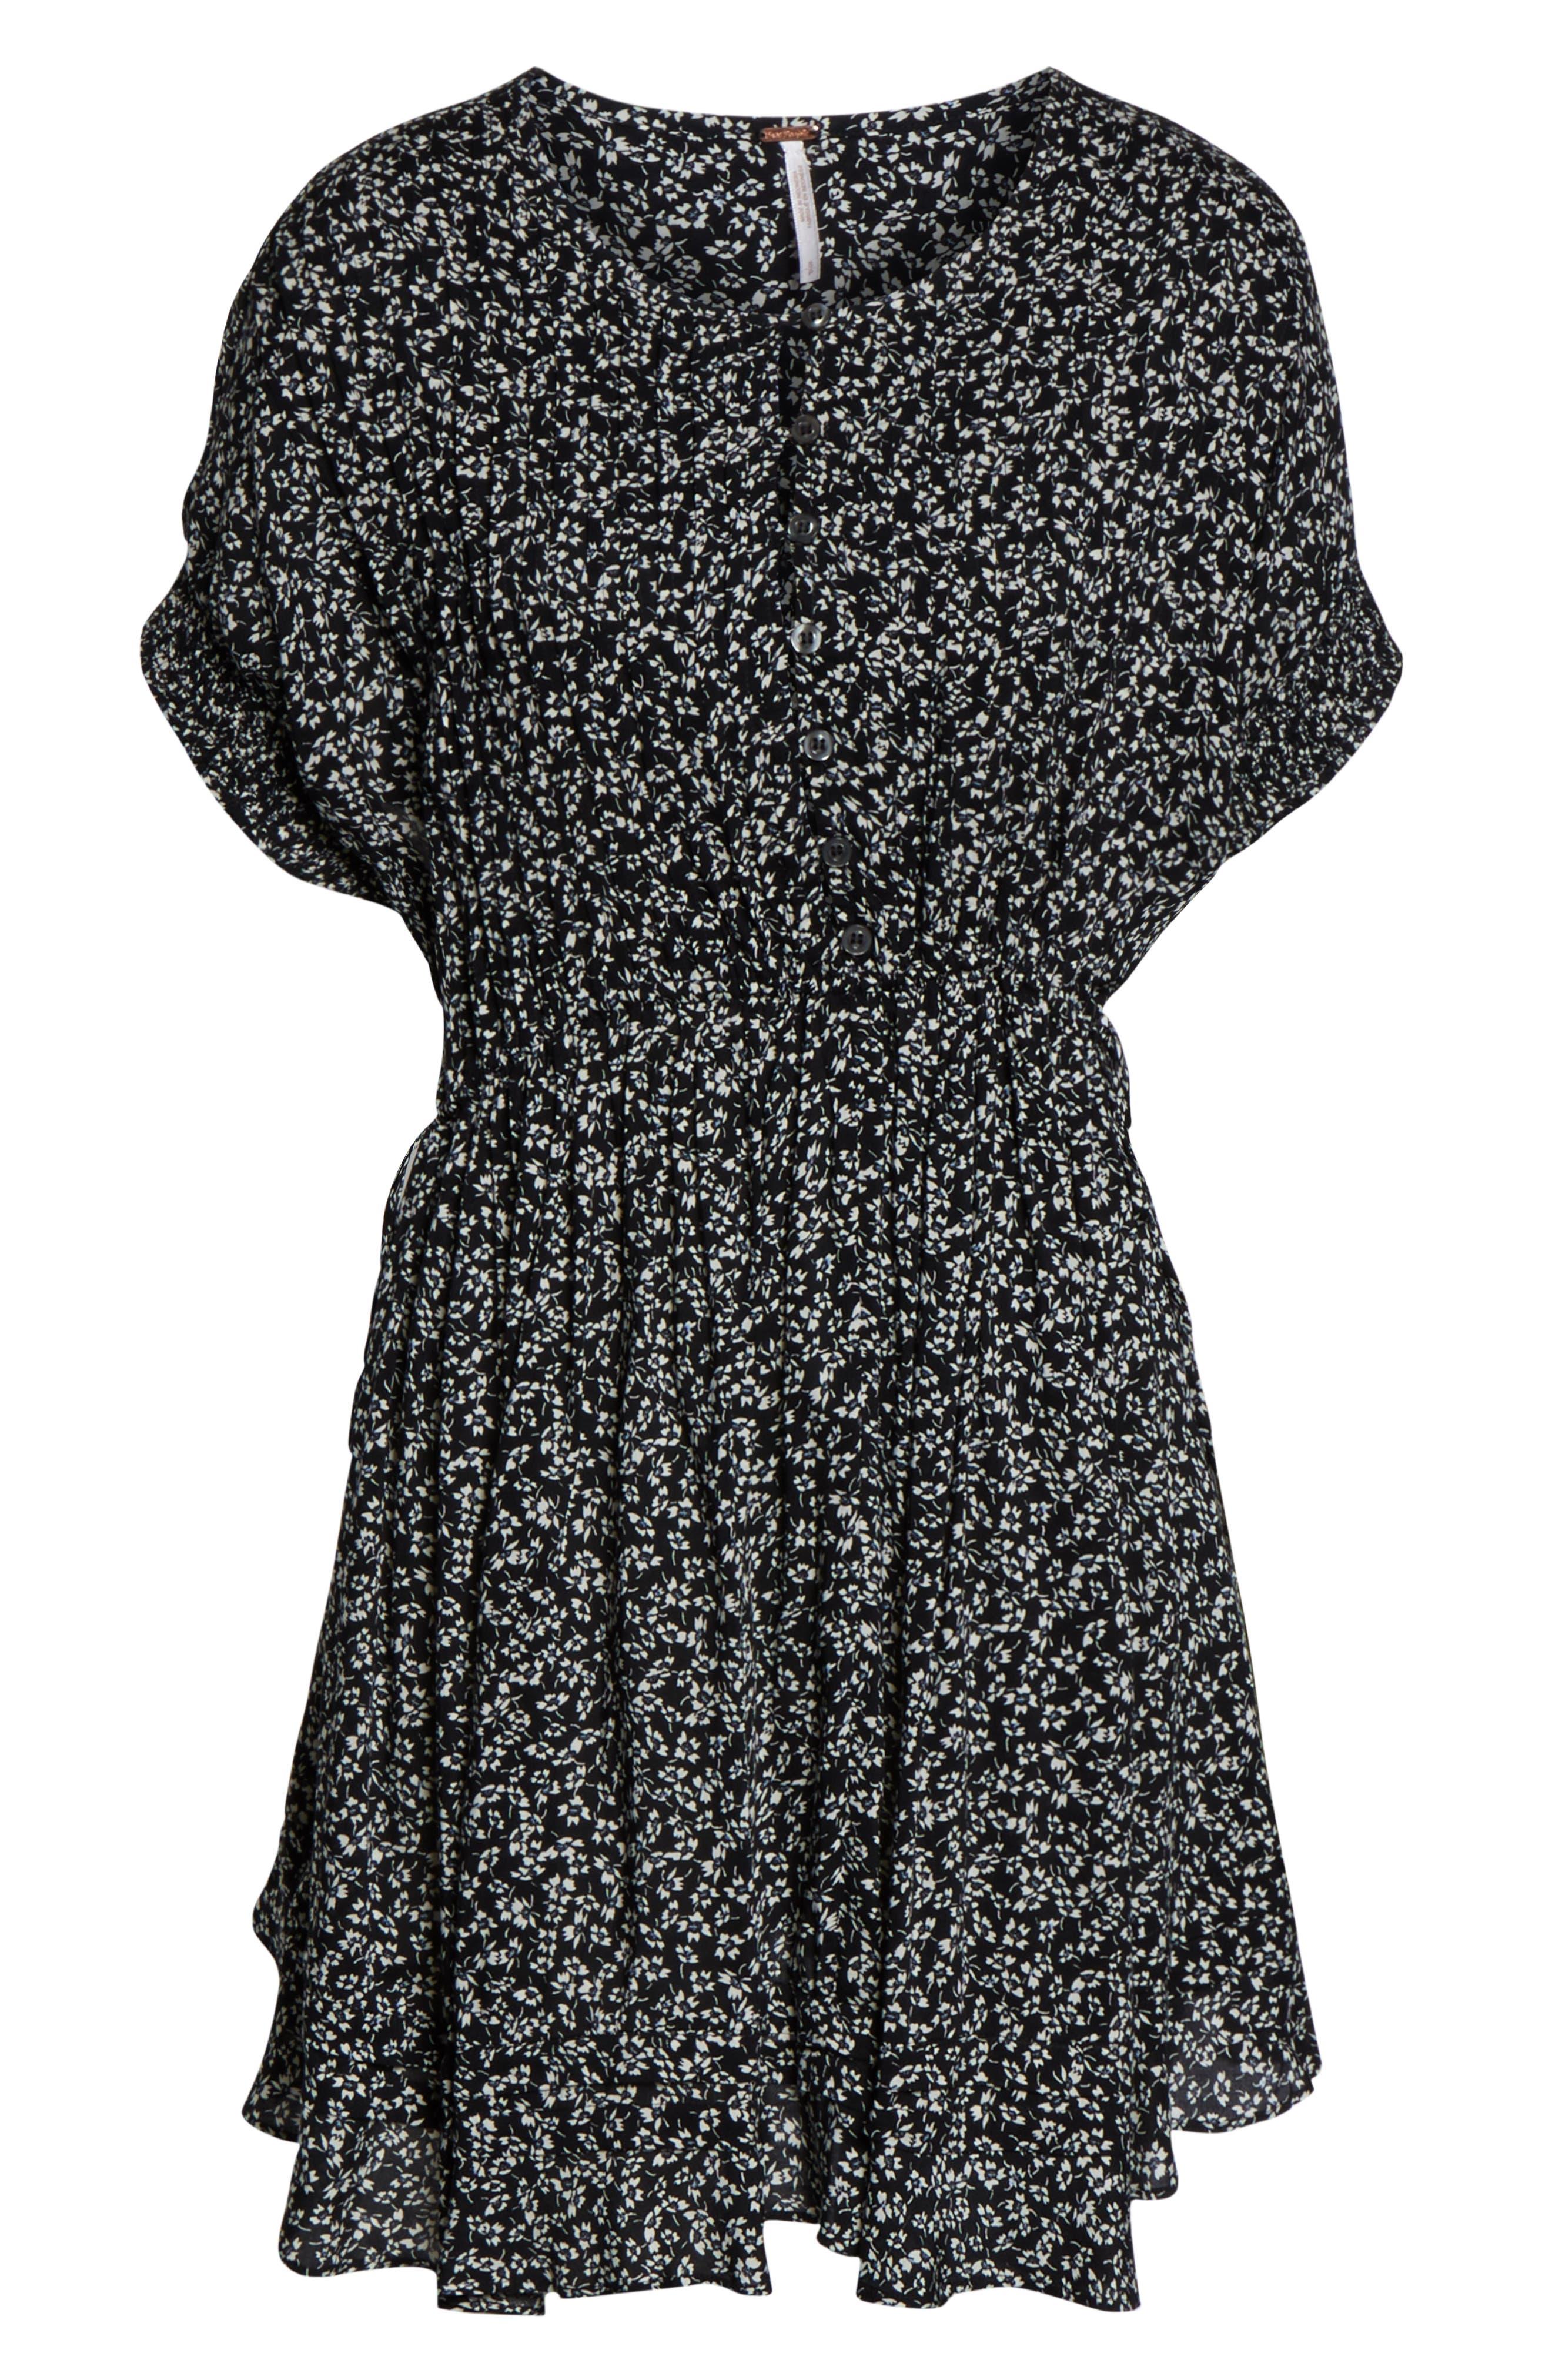 One Fine Day Minidress,                             Alternate thumbnail 6, color,                             BLACK COMBO